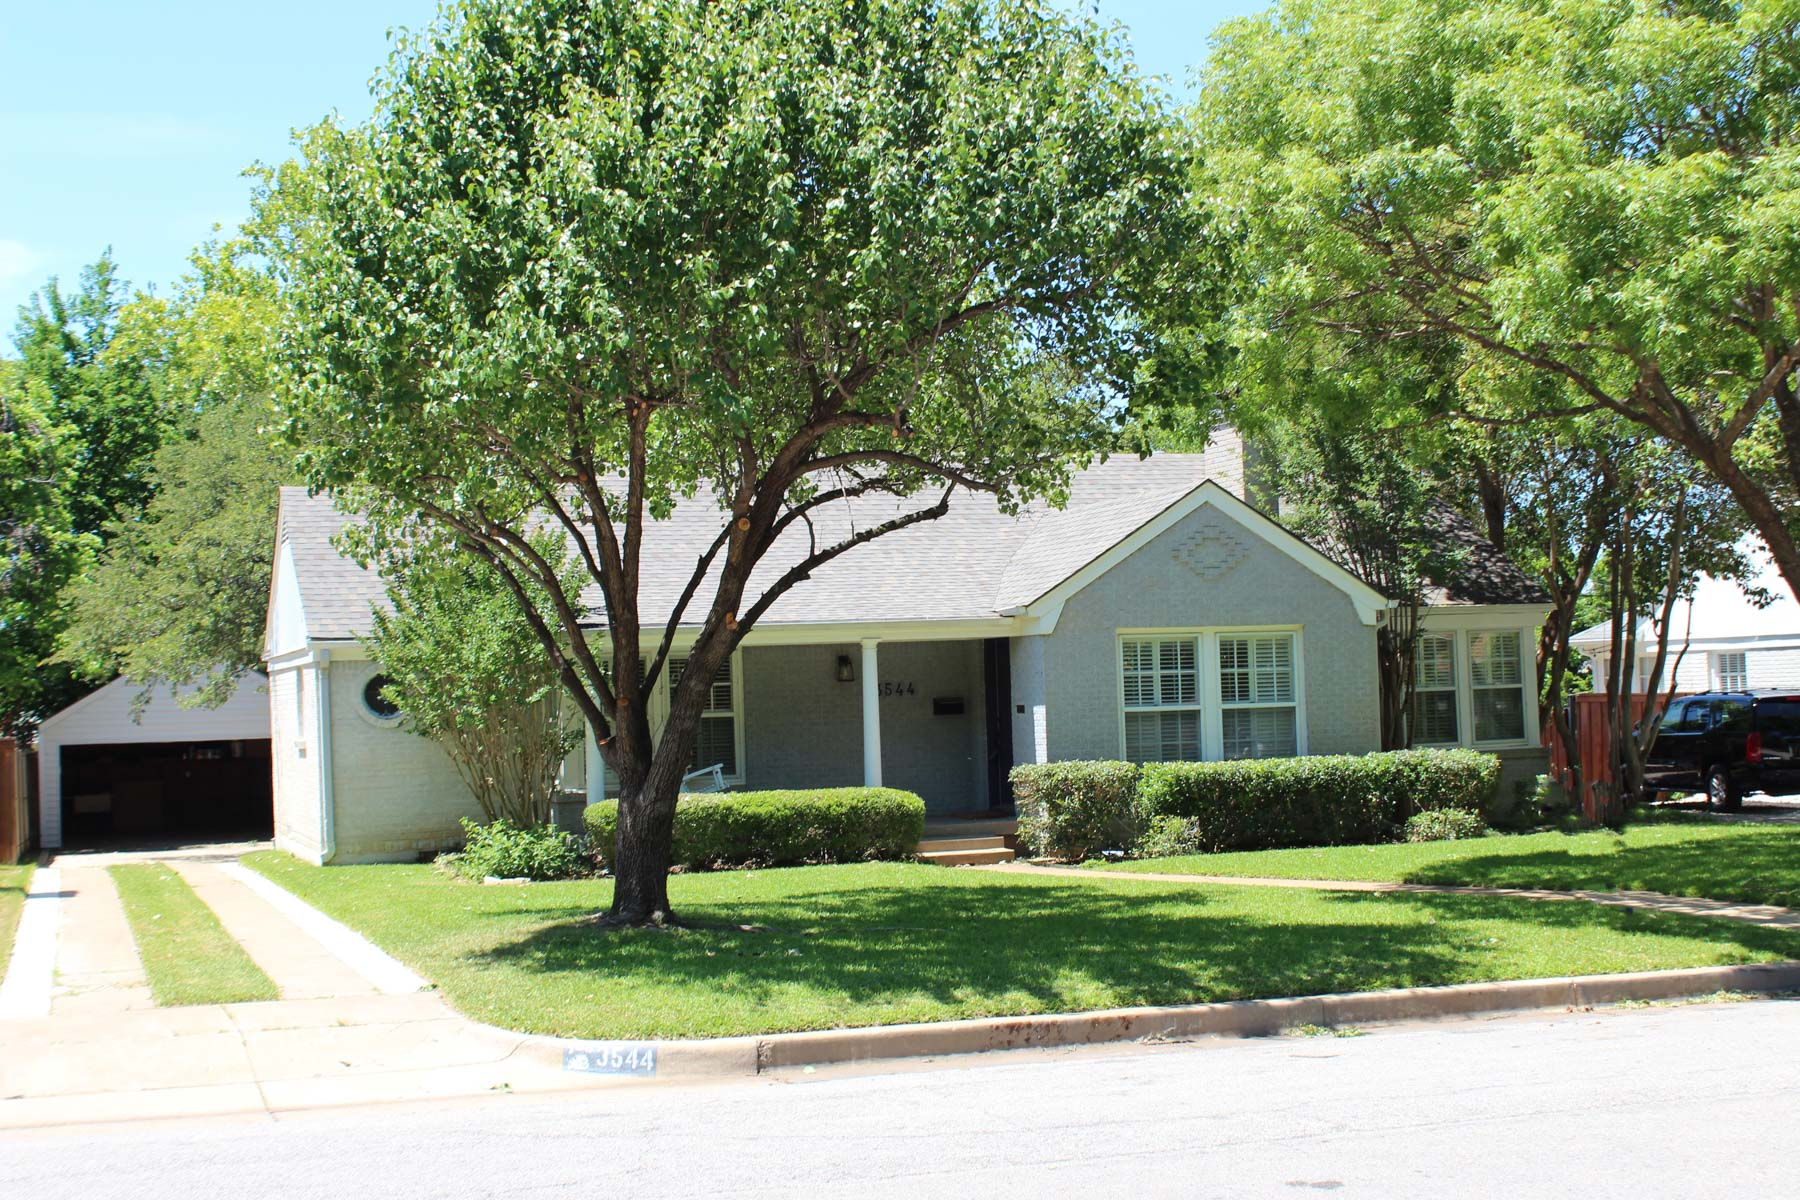 獨棟家庭住宅 為 出售 在 Charming Updated Traditional Near TCU 3544 Harwen Terr Fort Worth, 德克薩斯州, 76109 美國